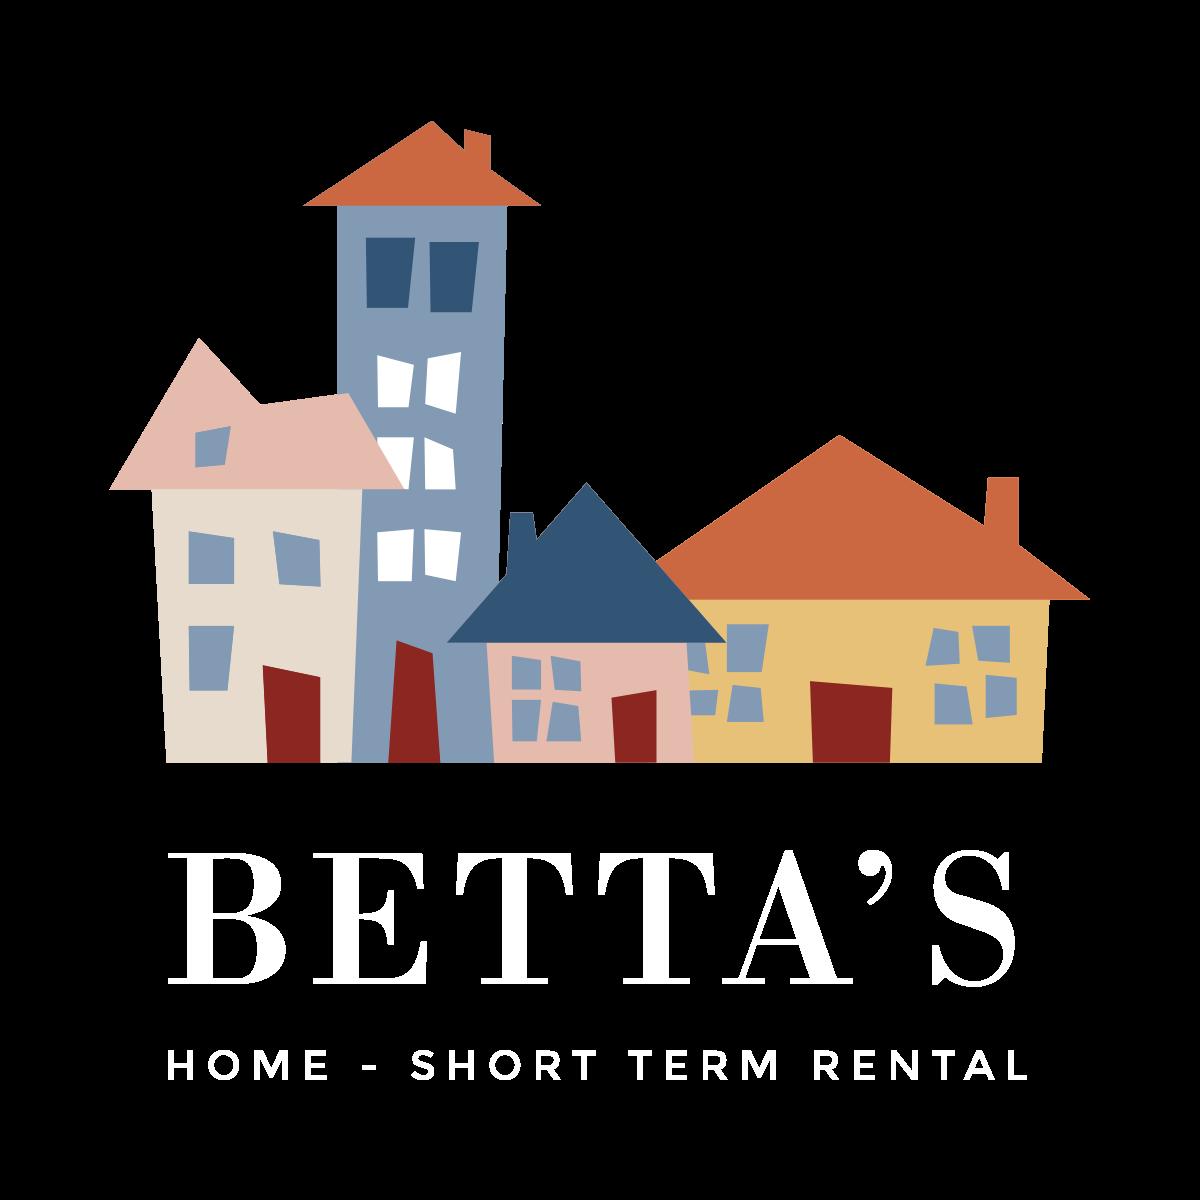 BETTA'S